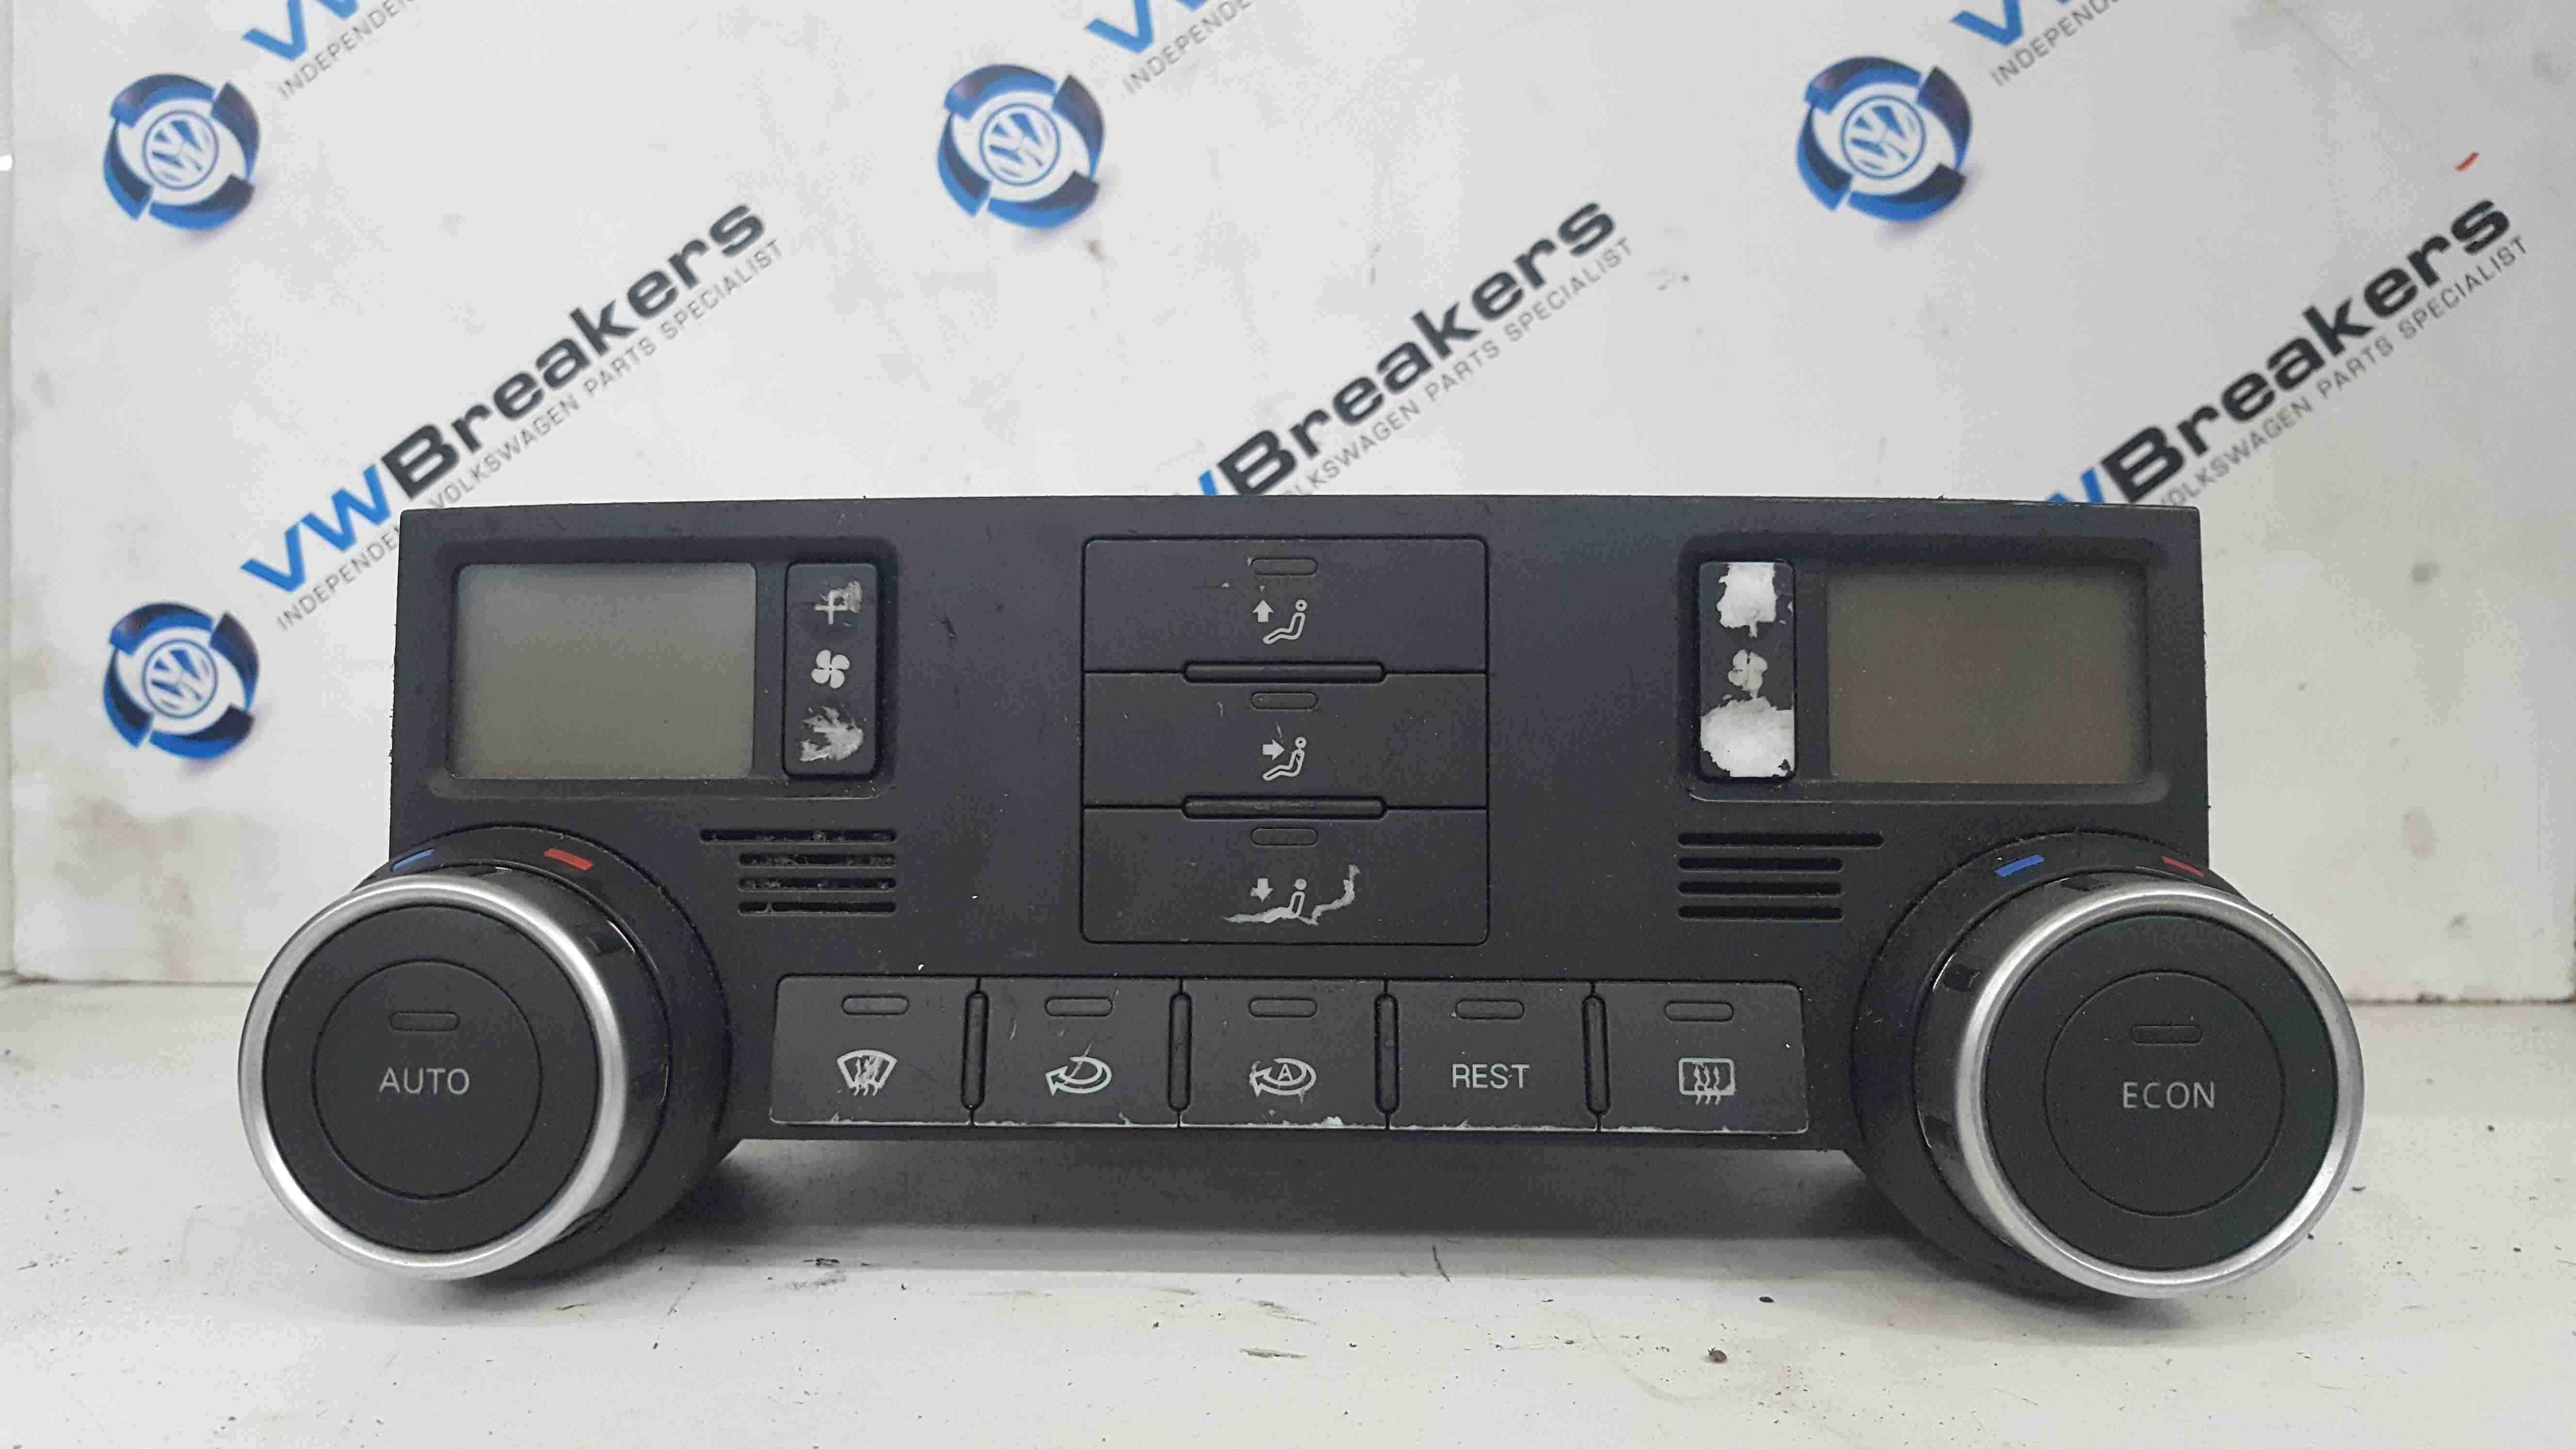 Volkswagen Touran 2003-2006 Climate Heater Control Panel 7L6907040L